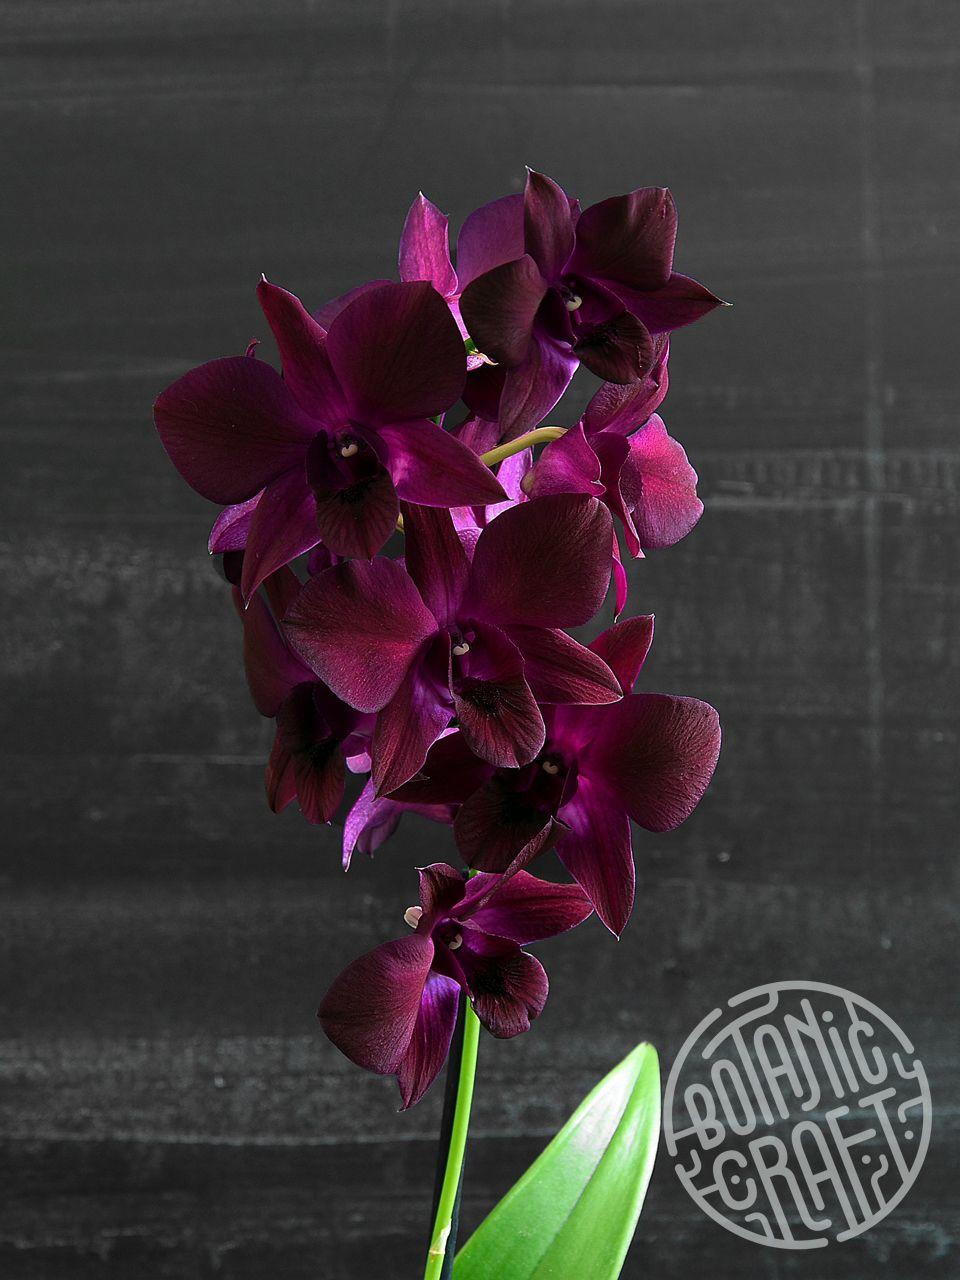 Orchid Dendrobium Thailand Black Orchids Growing Orchids Orchid Plants